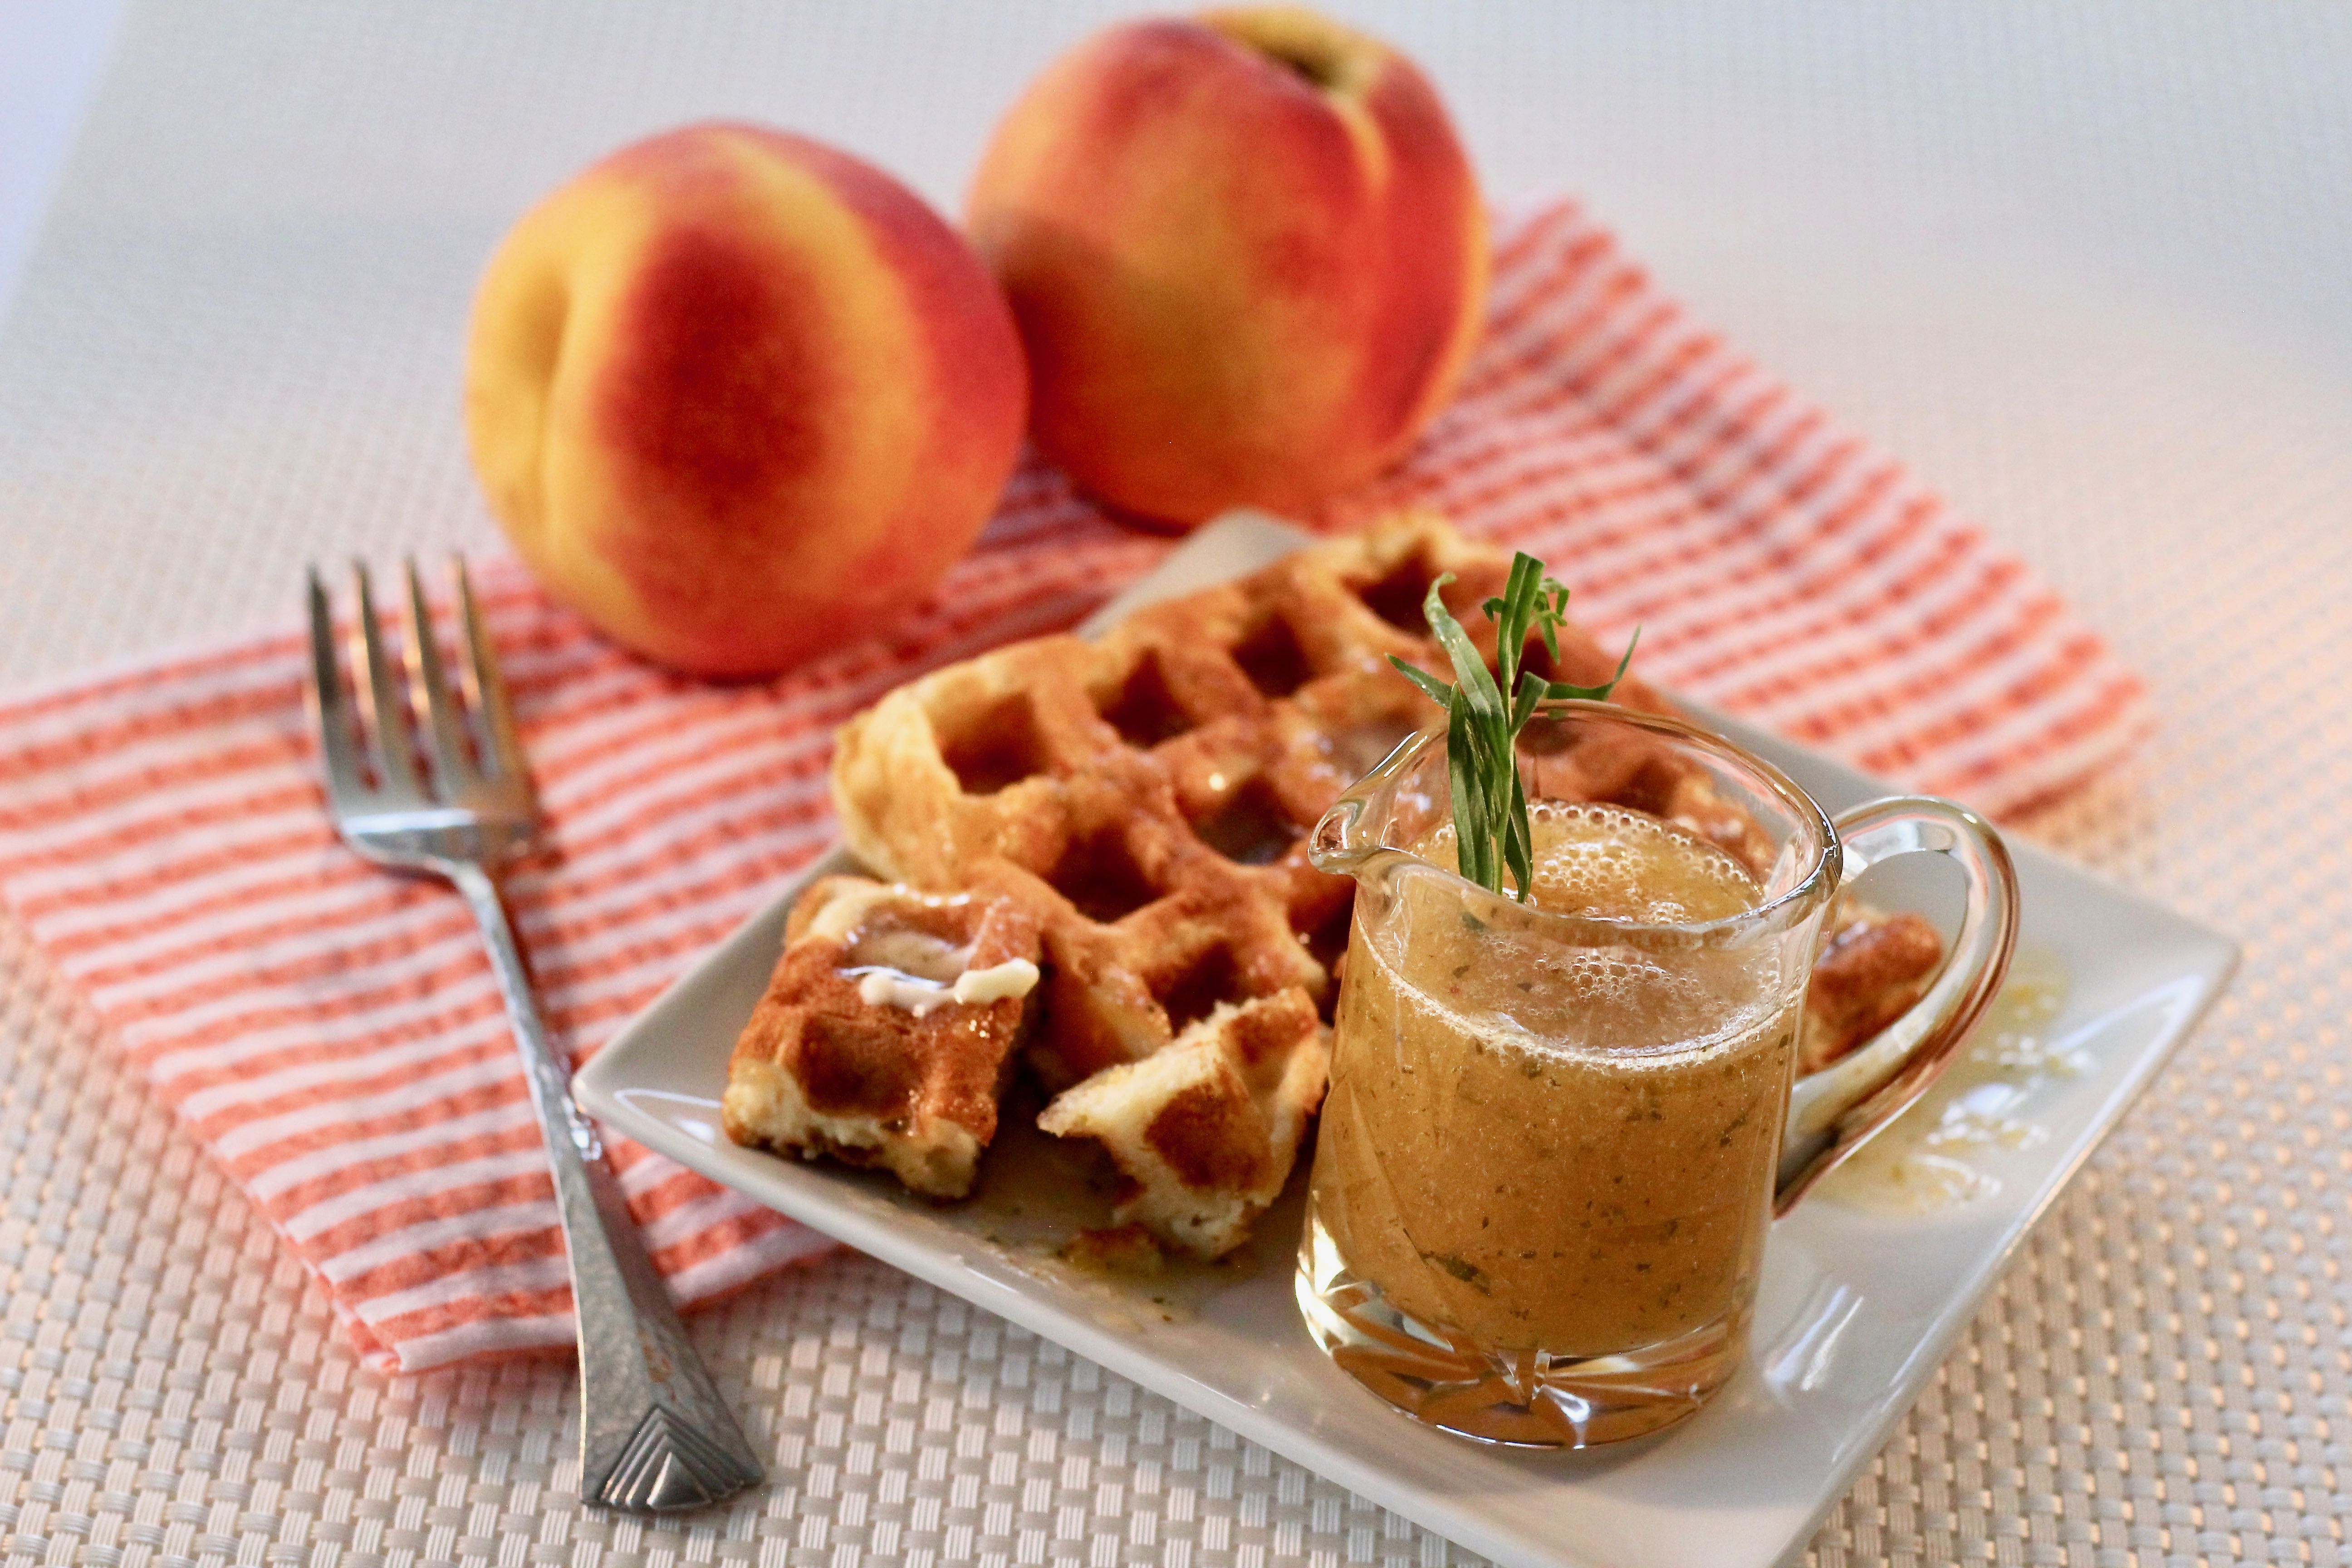 Peach-Tarragon Syrup